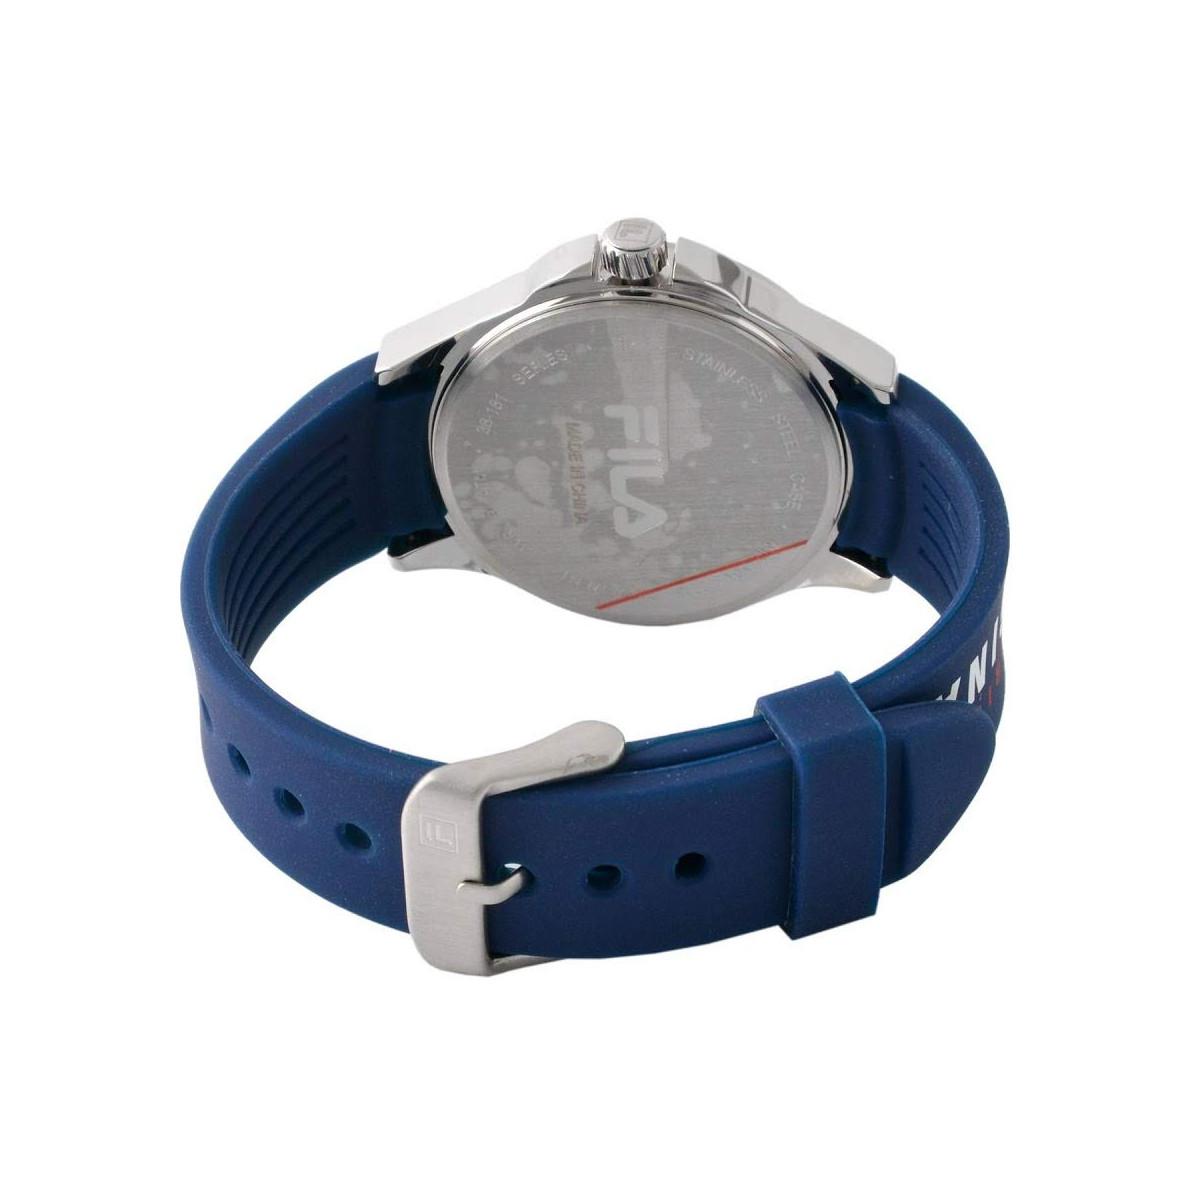 Montre homme FILA cadran bleu - 38-181-002